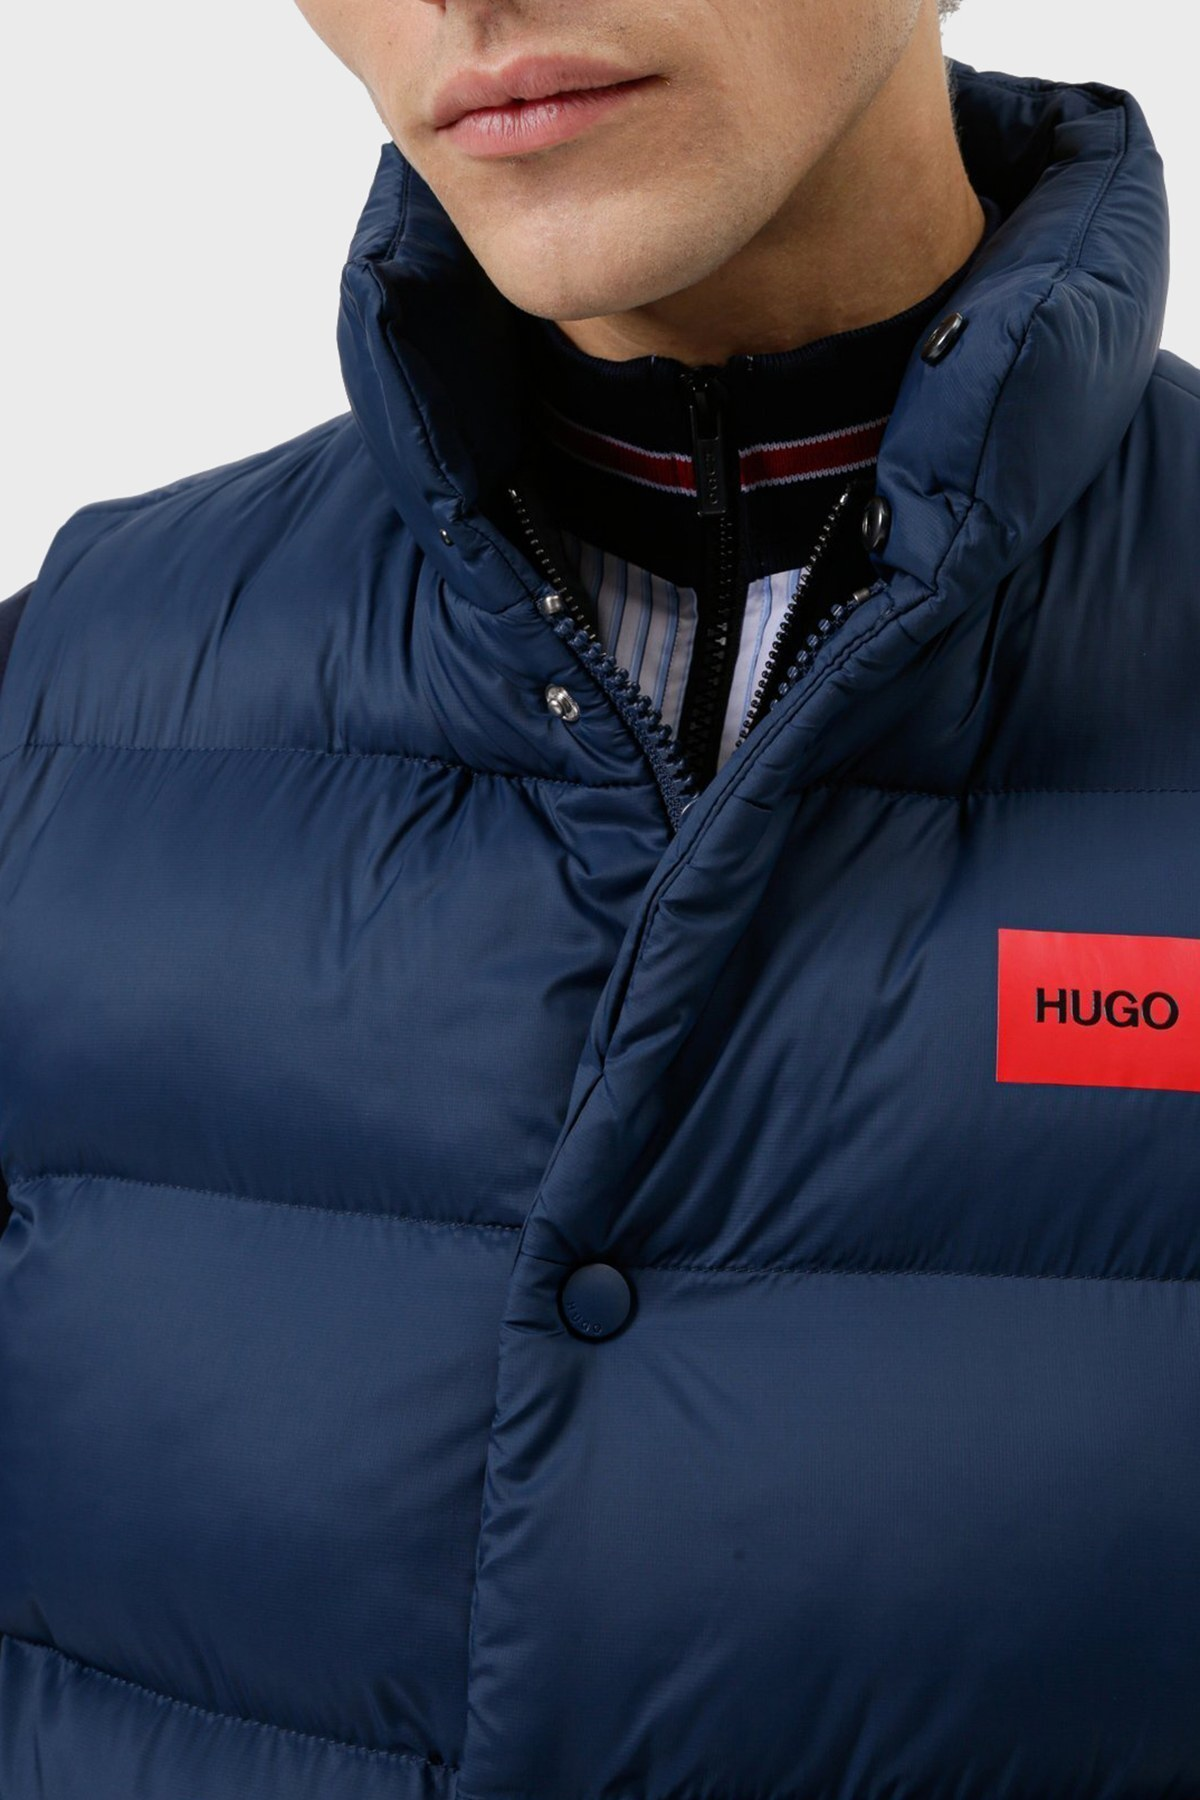 Hugo Boss Erkek Yelek 50456956 404 LACİVERT